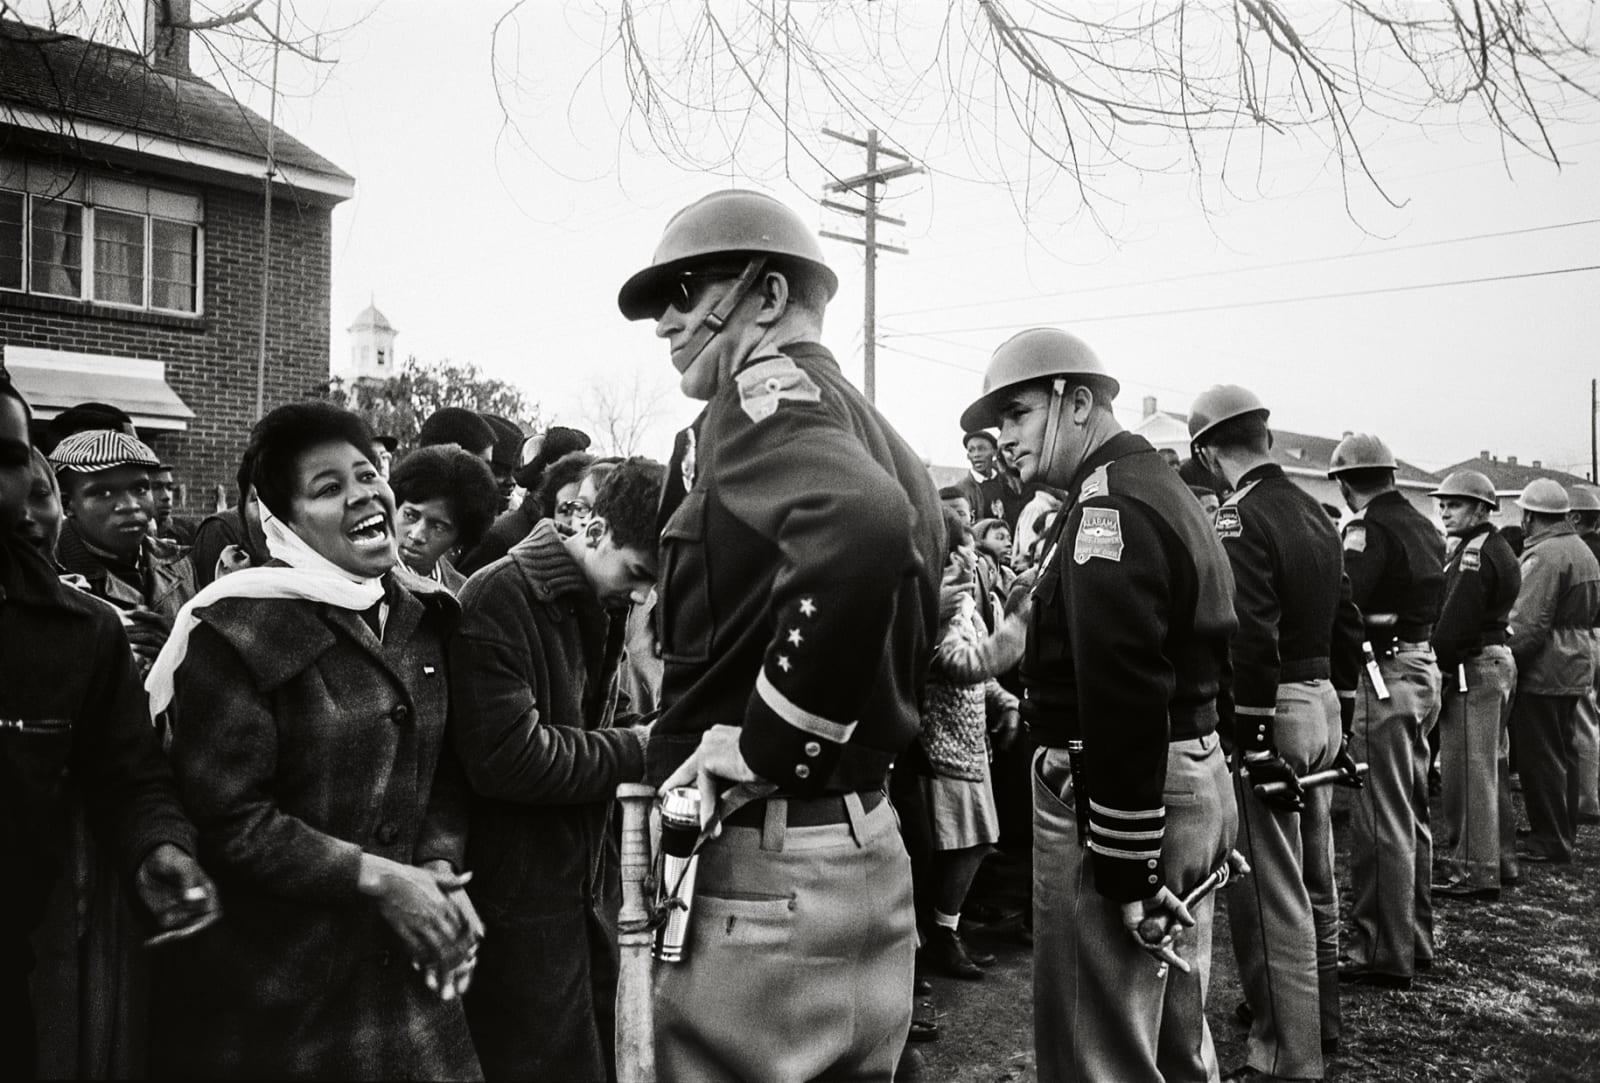 Steve Schapiro Demonstrator and Troopers, Selma, 1965